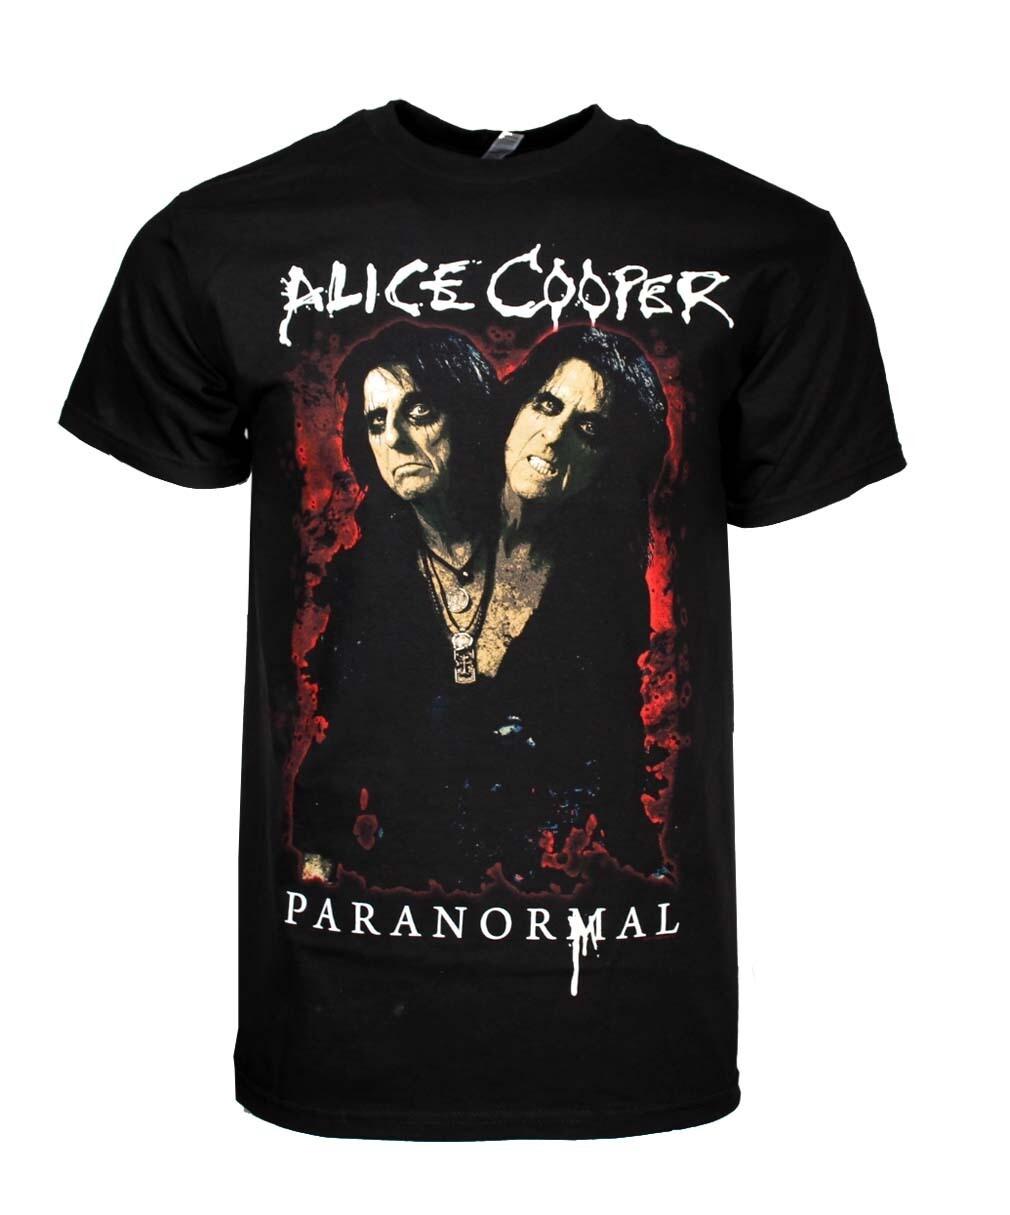 Alice Cooper Paranormal T Shirt